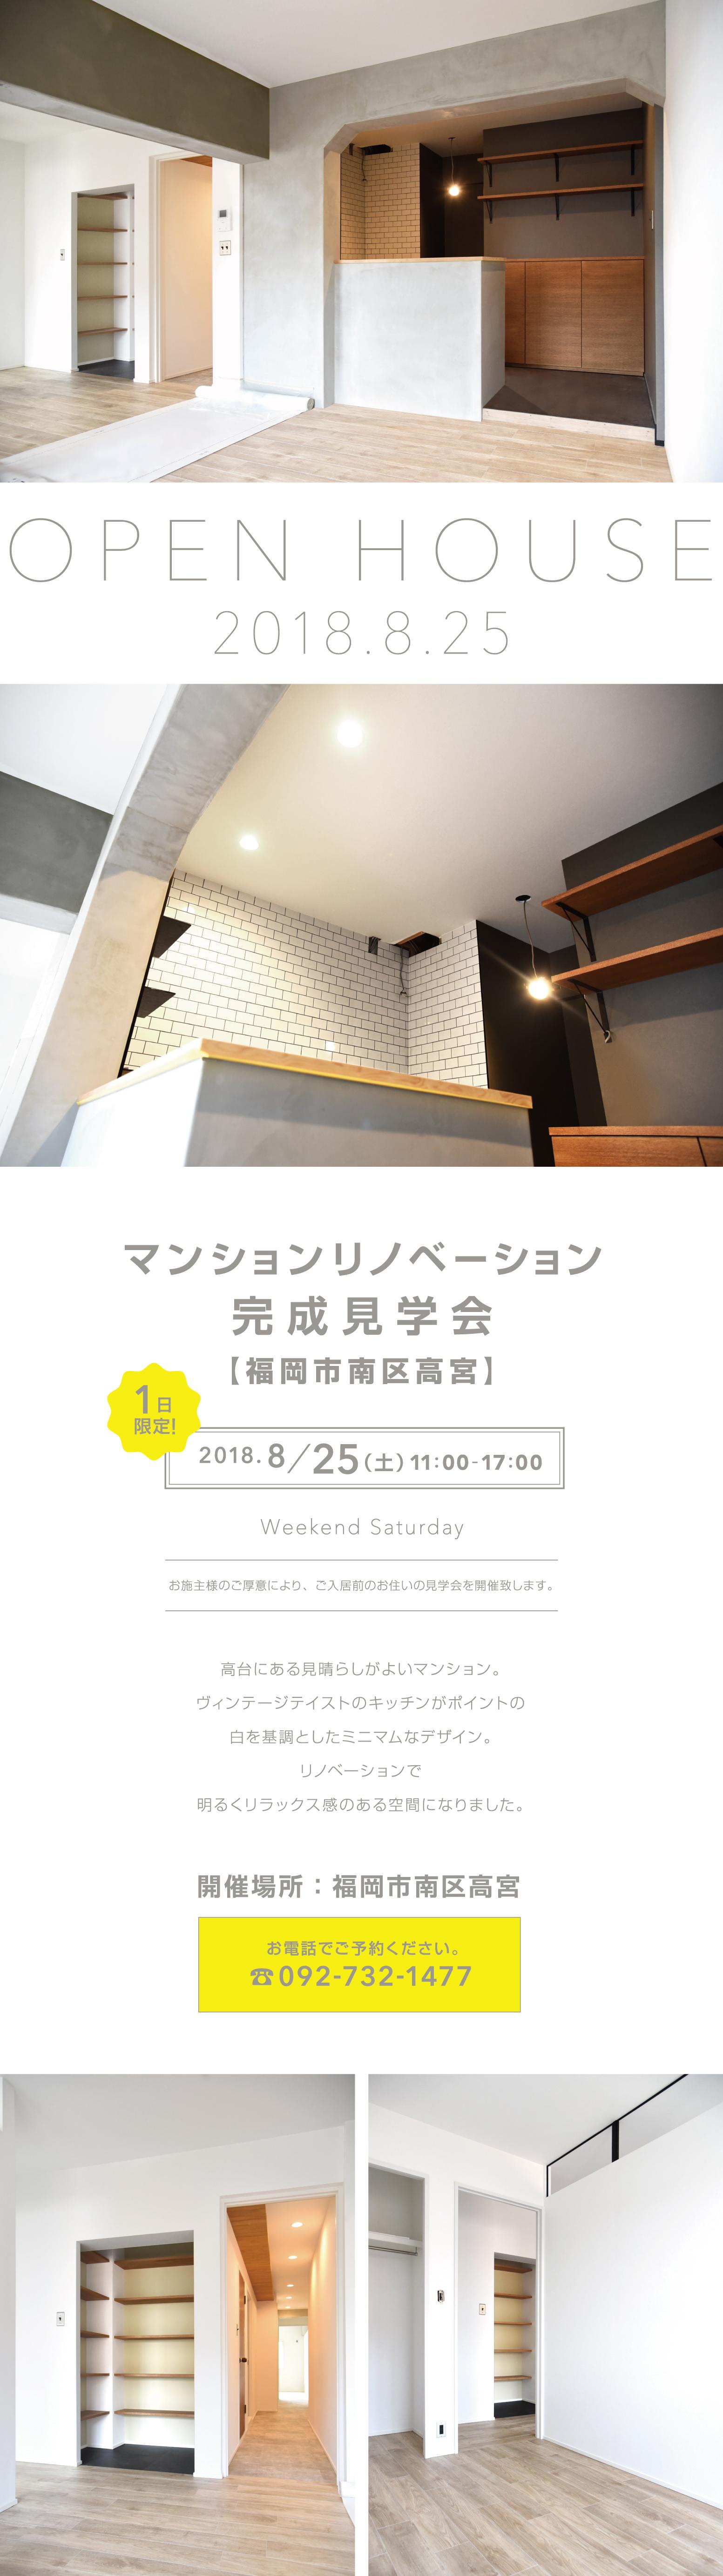 8/25 OPEN HOUSE!